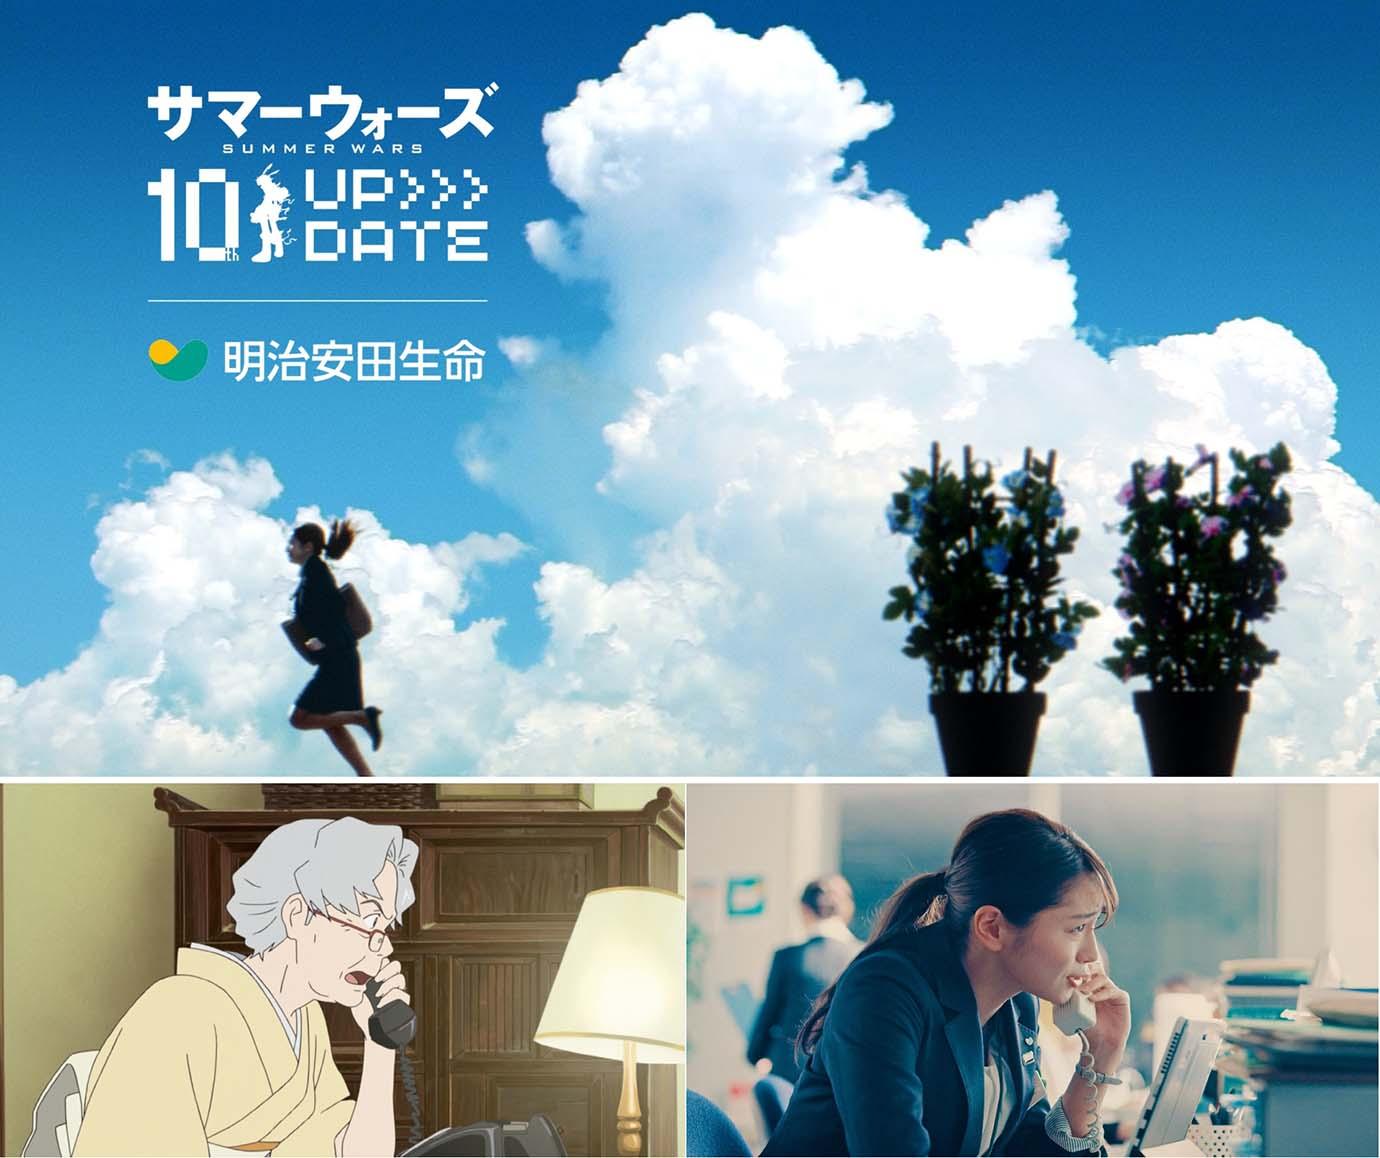 meijiyasuda-summer-wars3